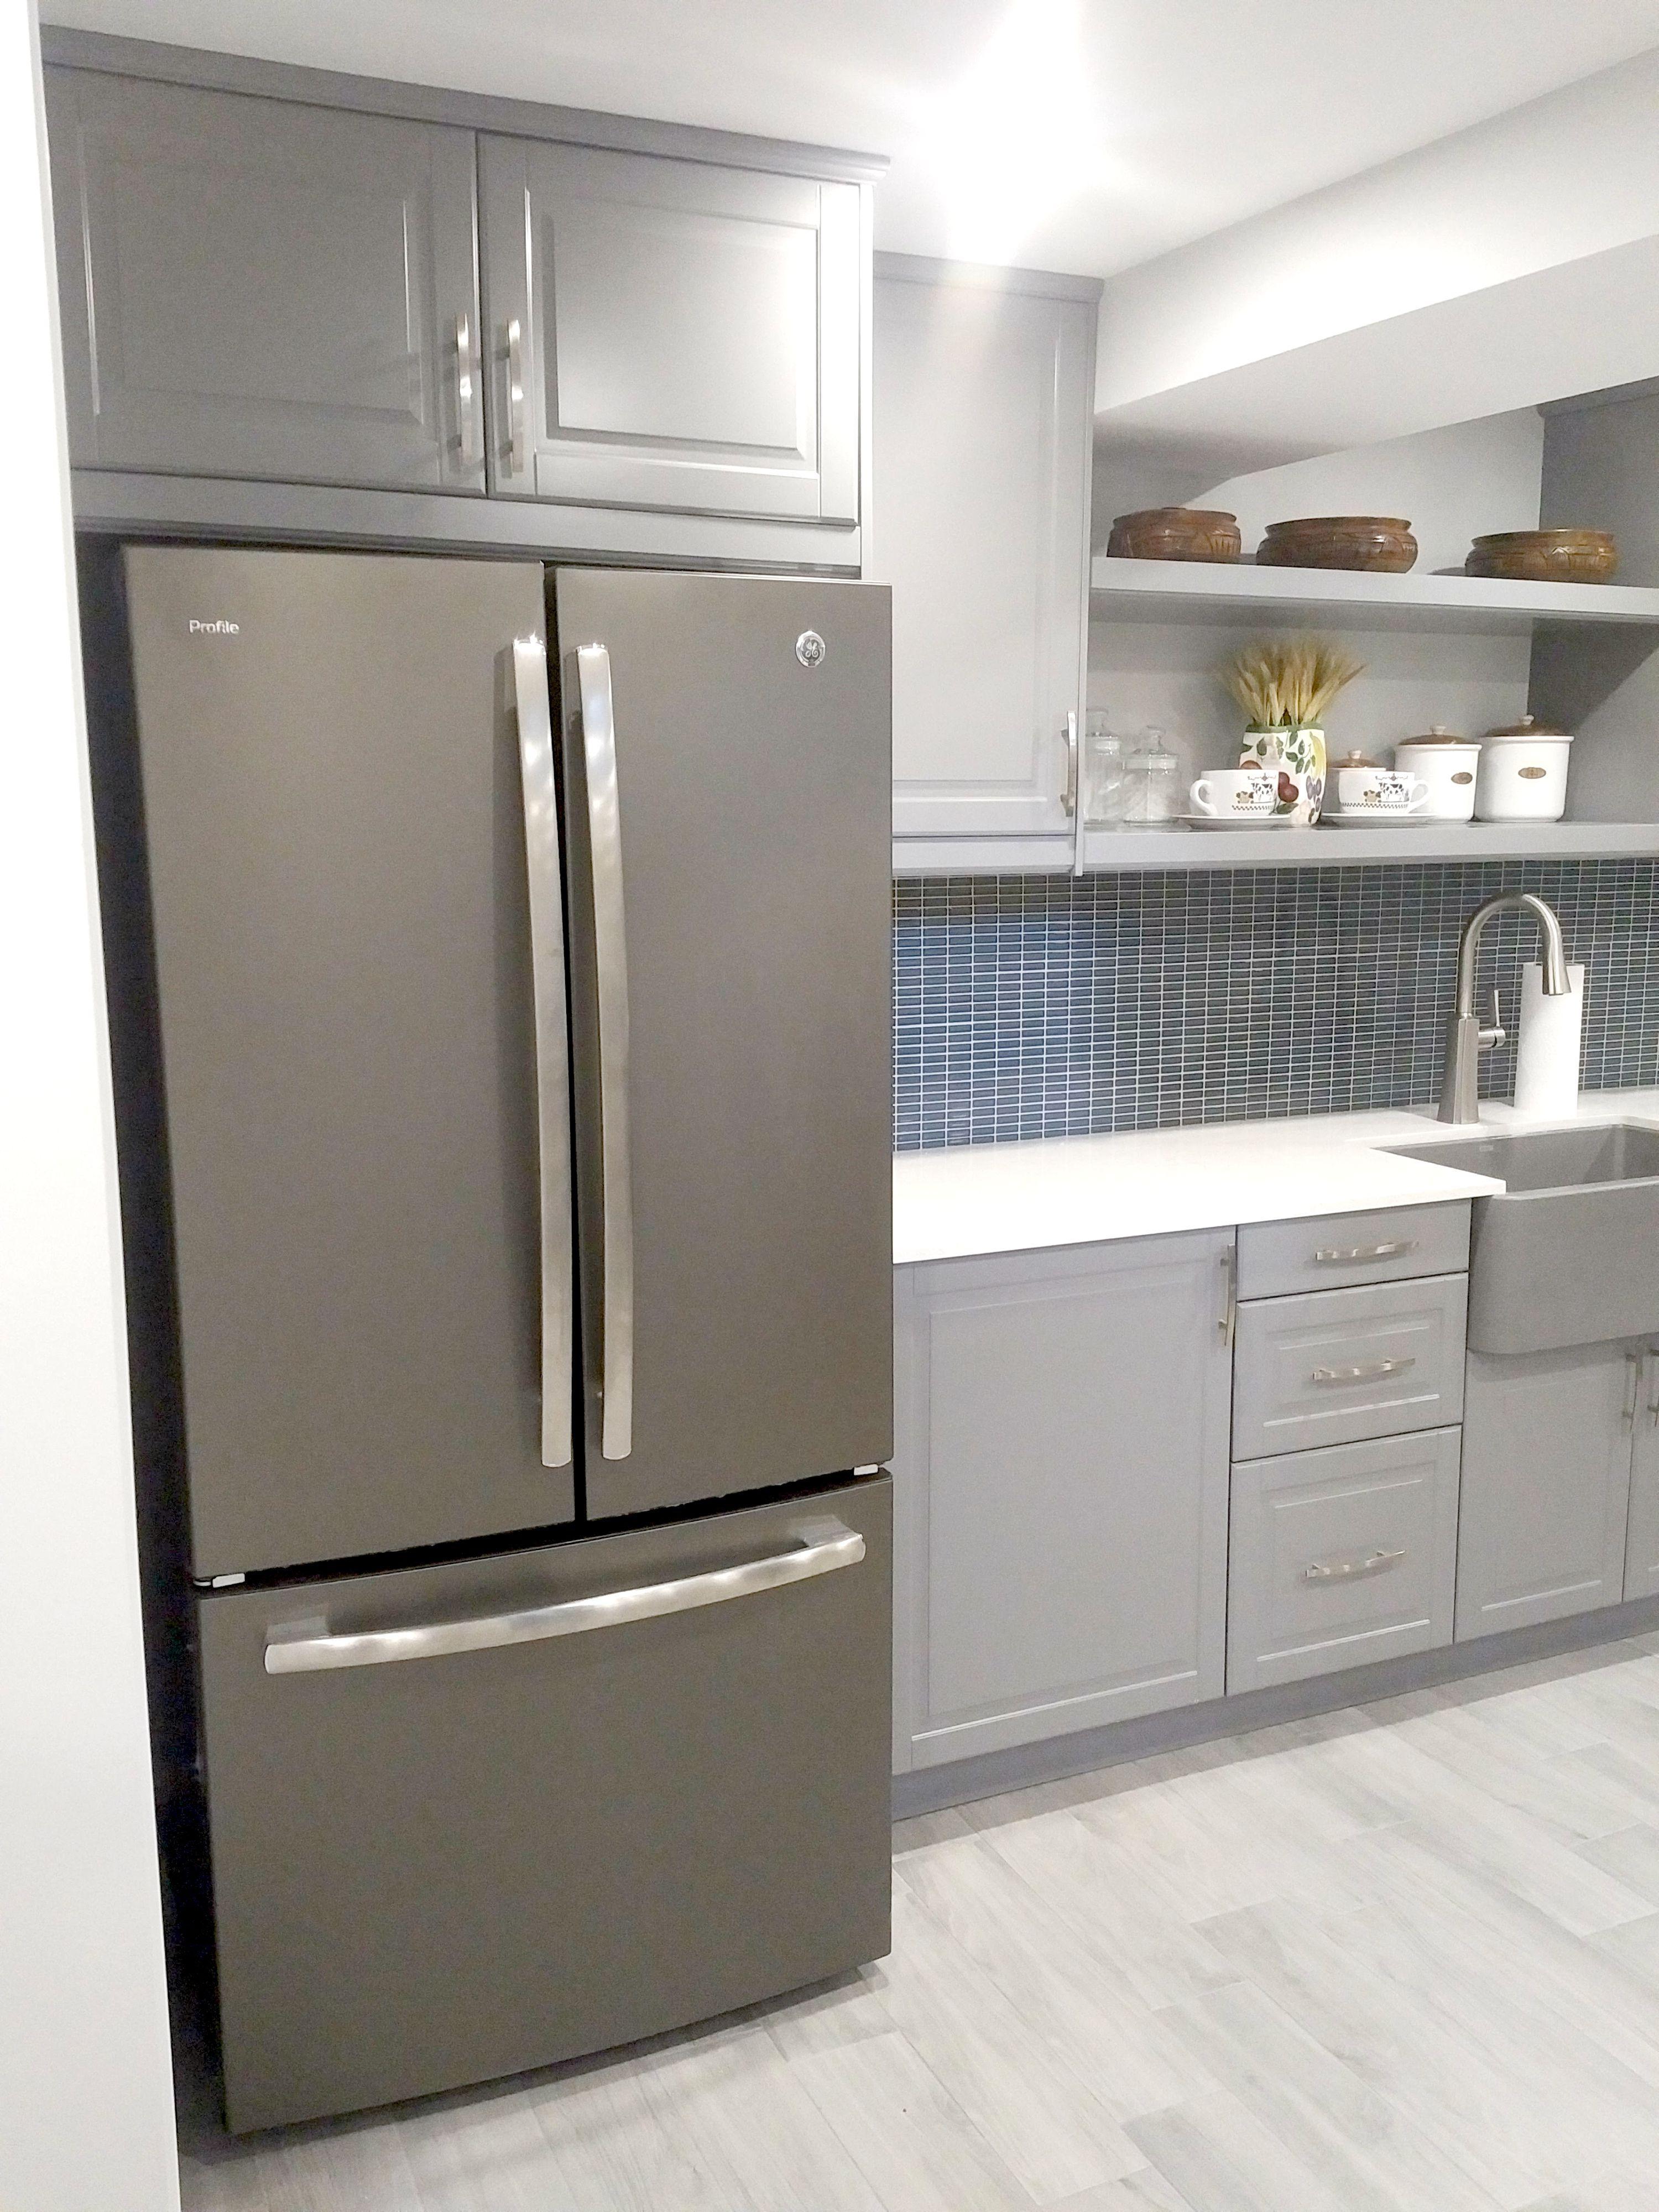 Carrara Look Quartz Countertop, Raised Panel Shaker Style ...